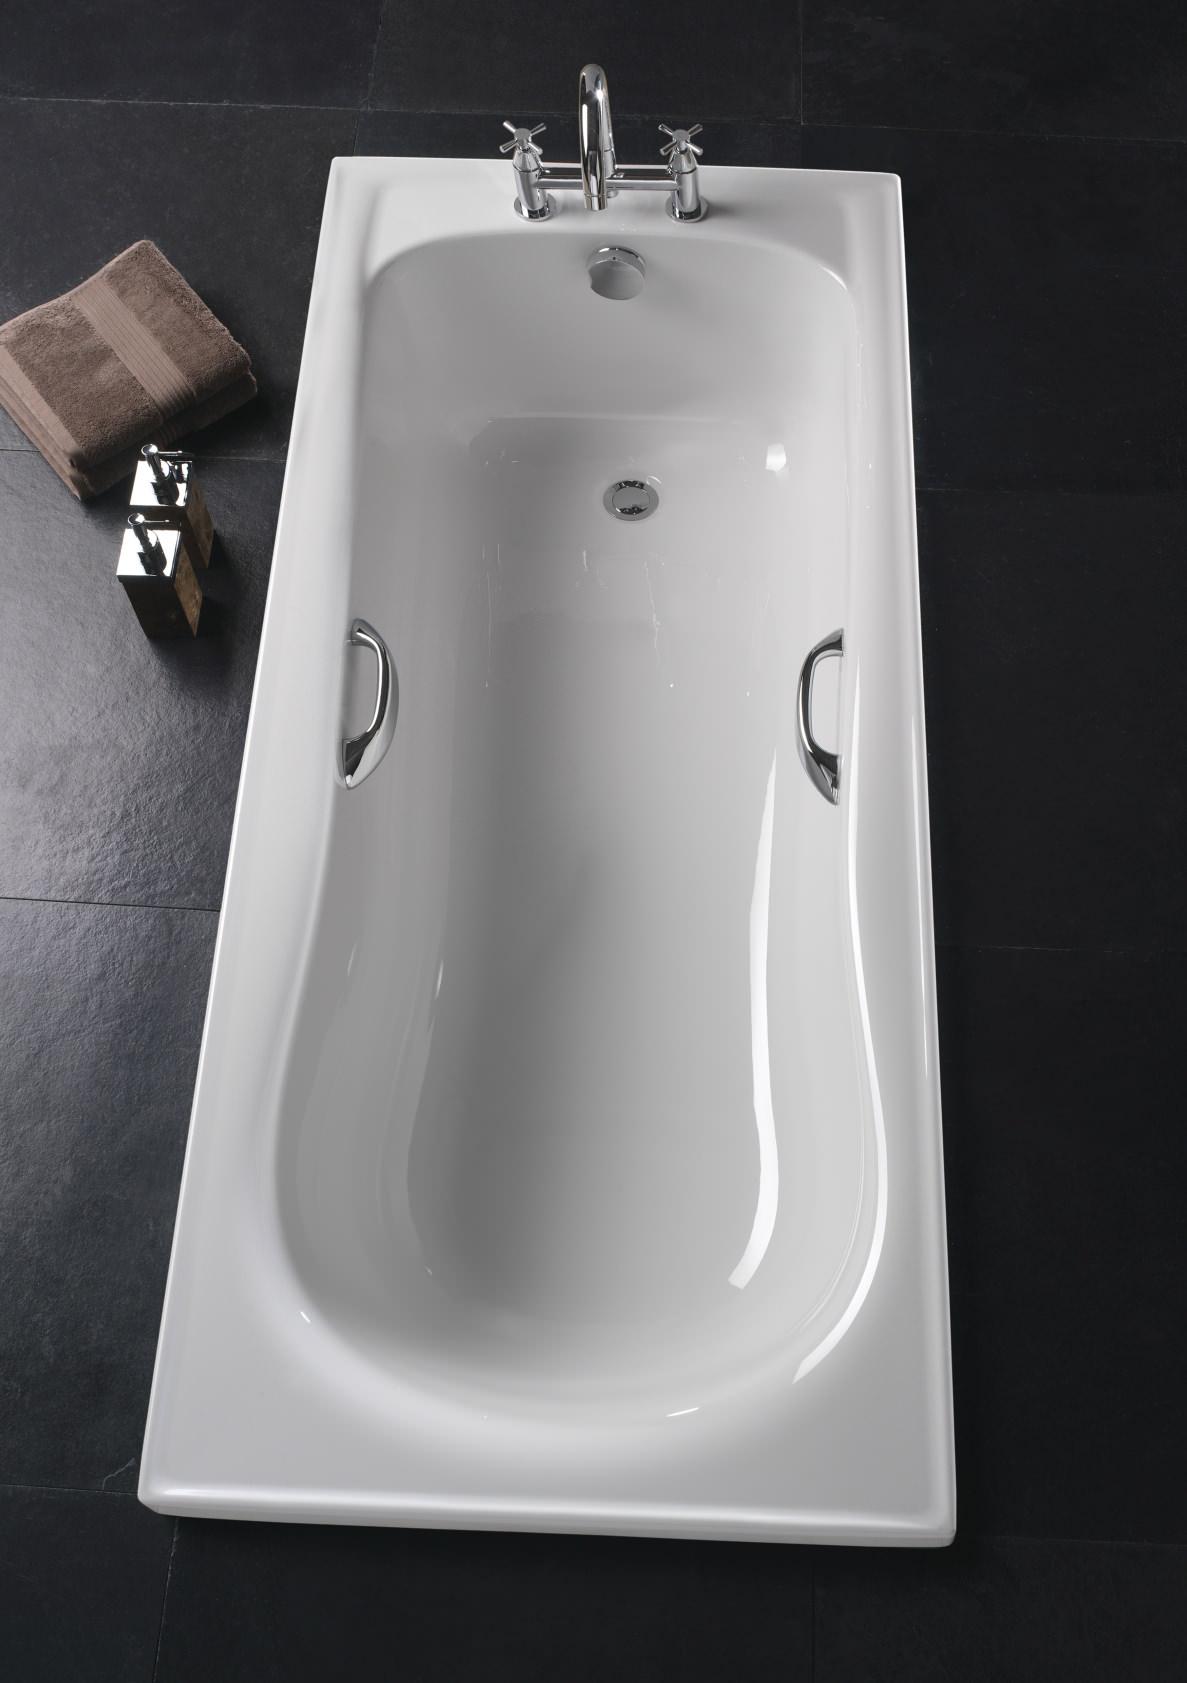 Twyford Galerie Single Ended Acrylic Bath With Grips 1500 x 700mm